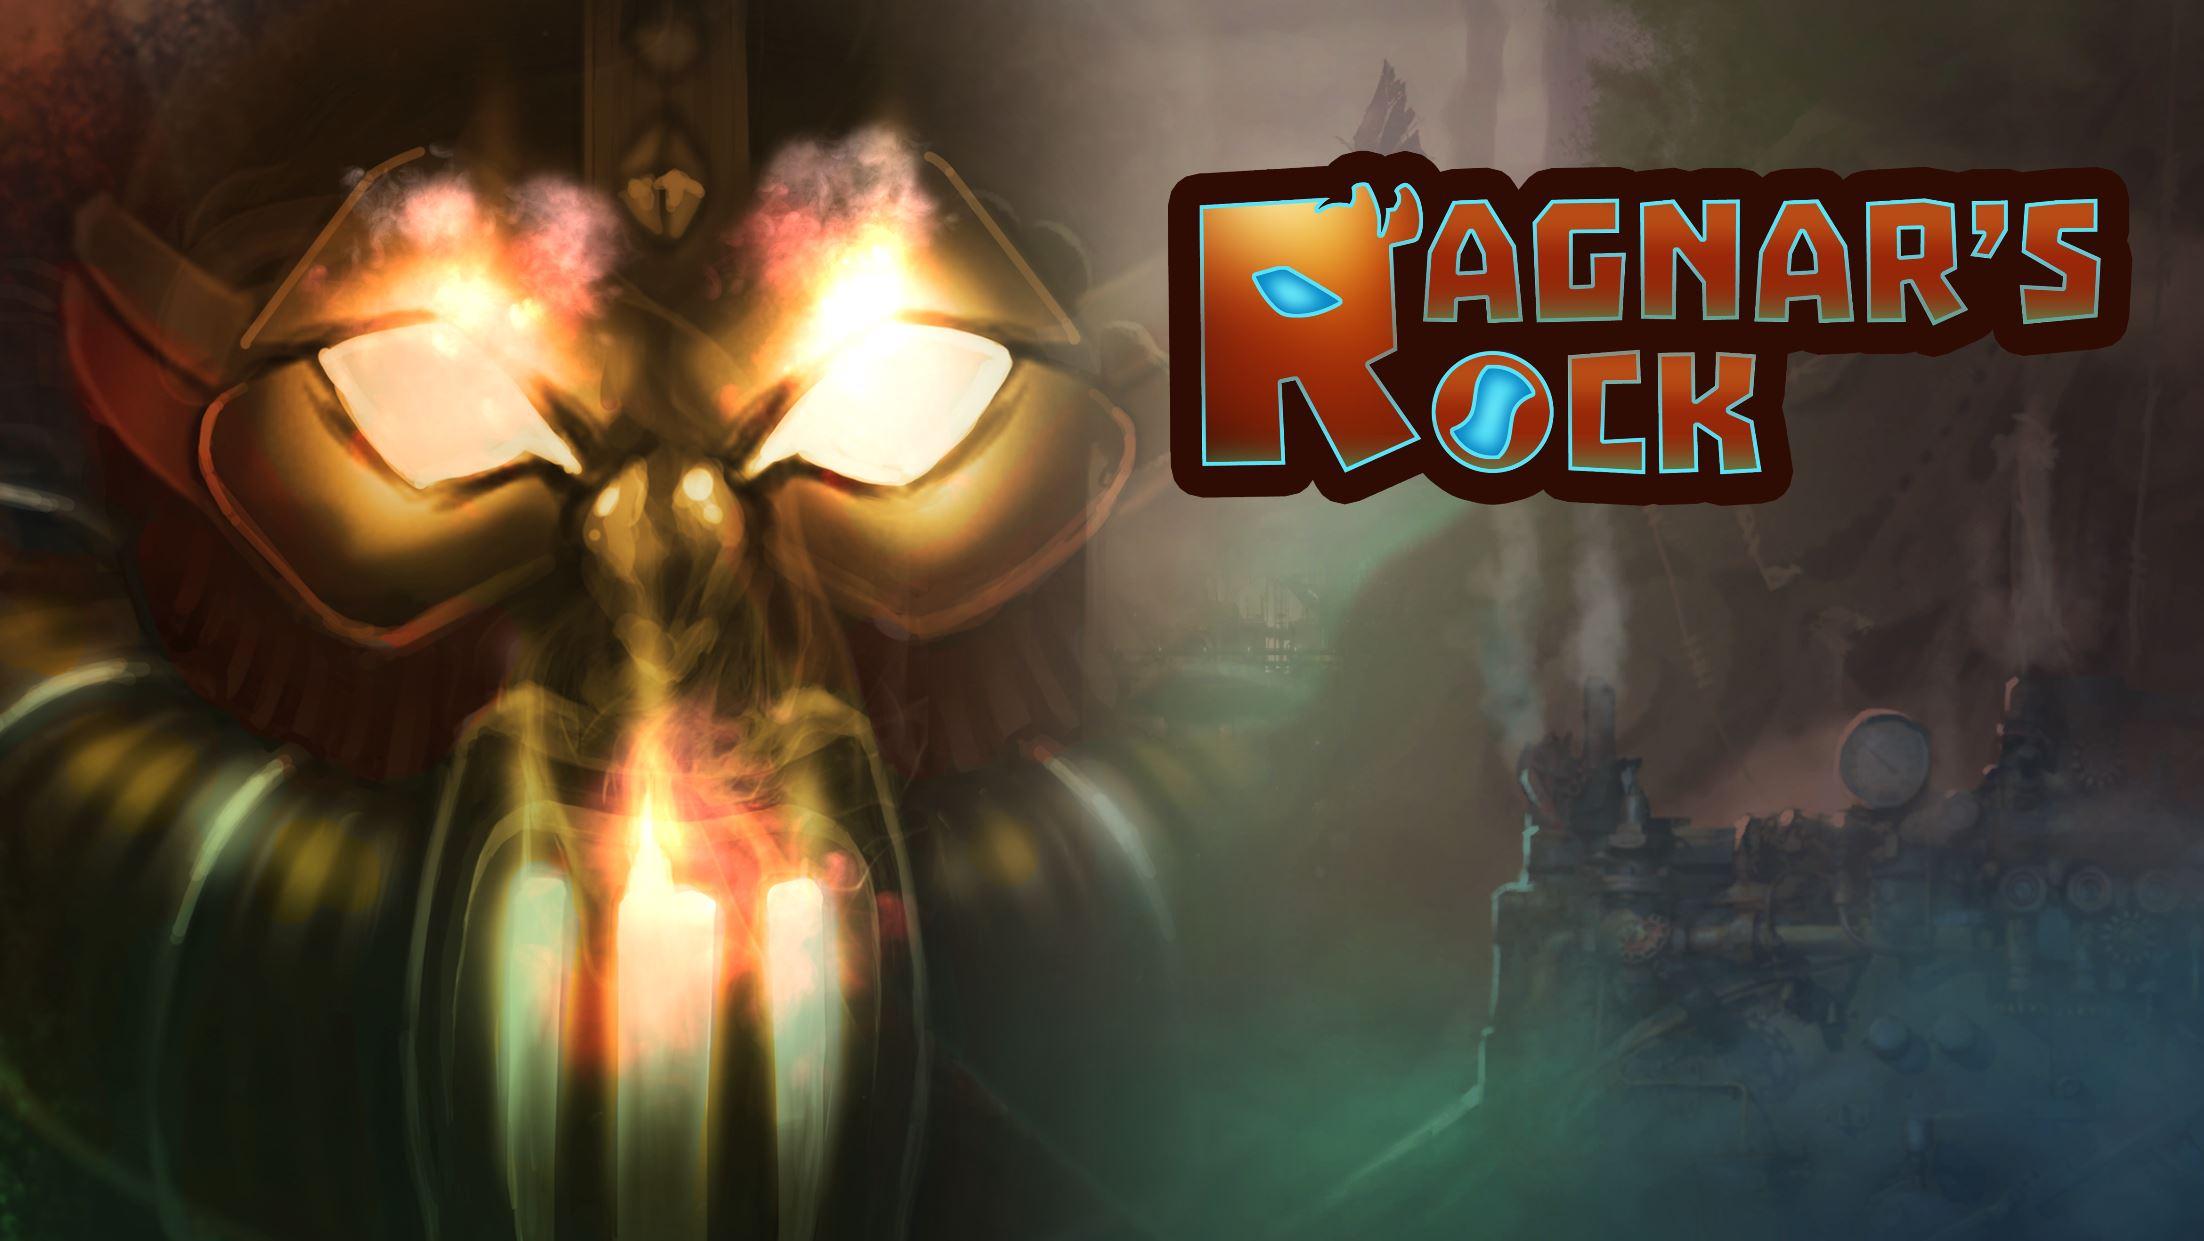 Ragnar's Rock